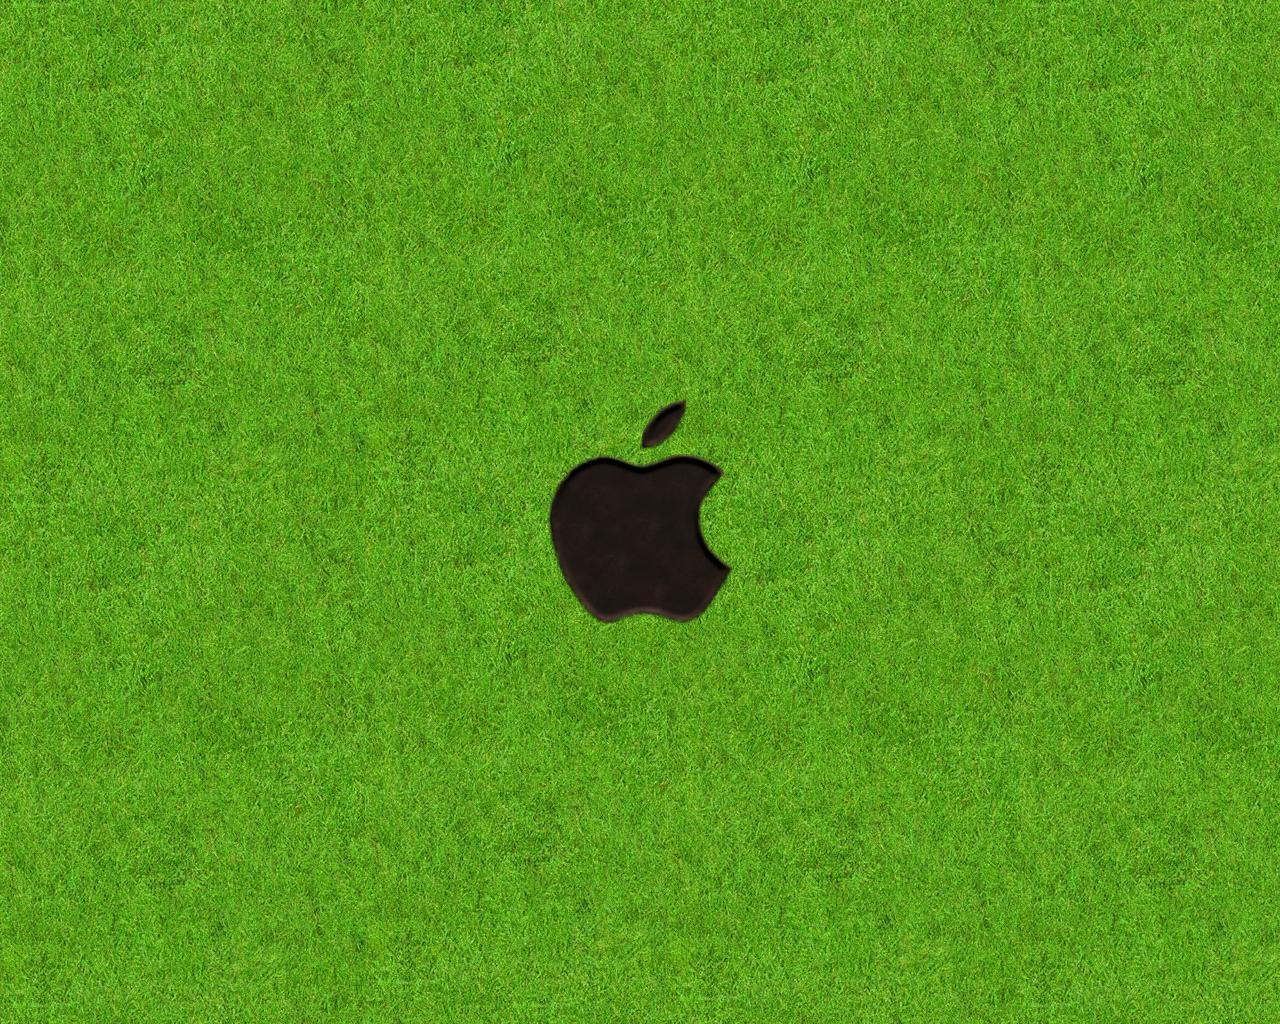 apple fruit background grass - photo #30